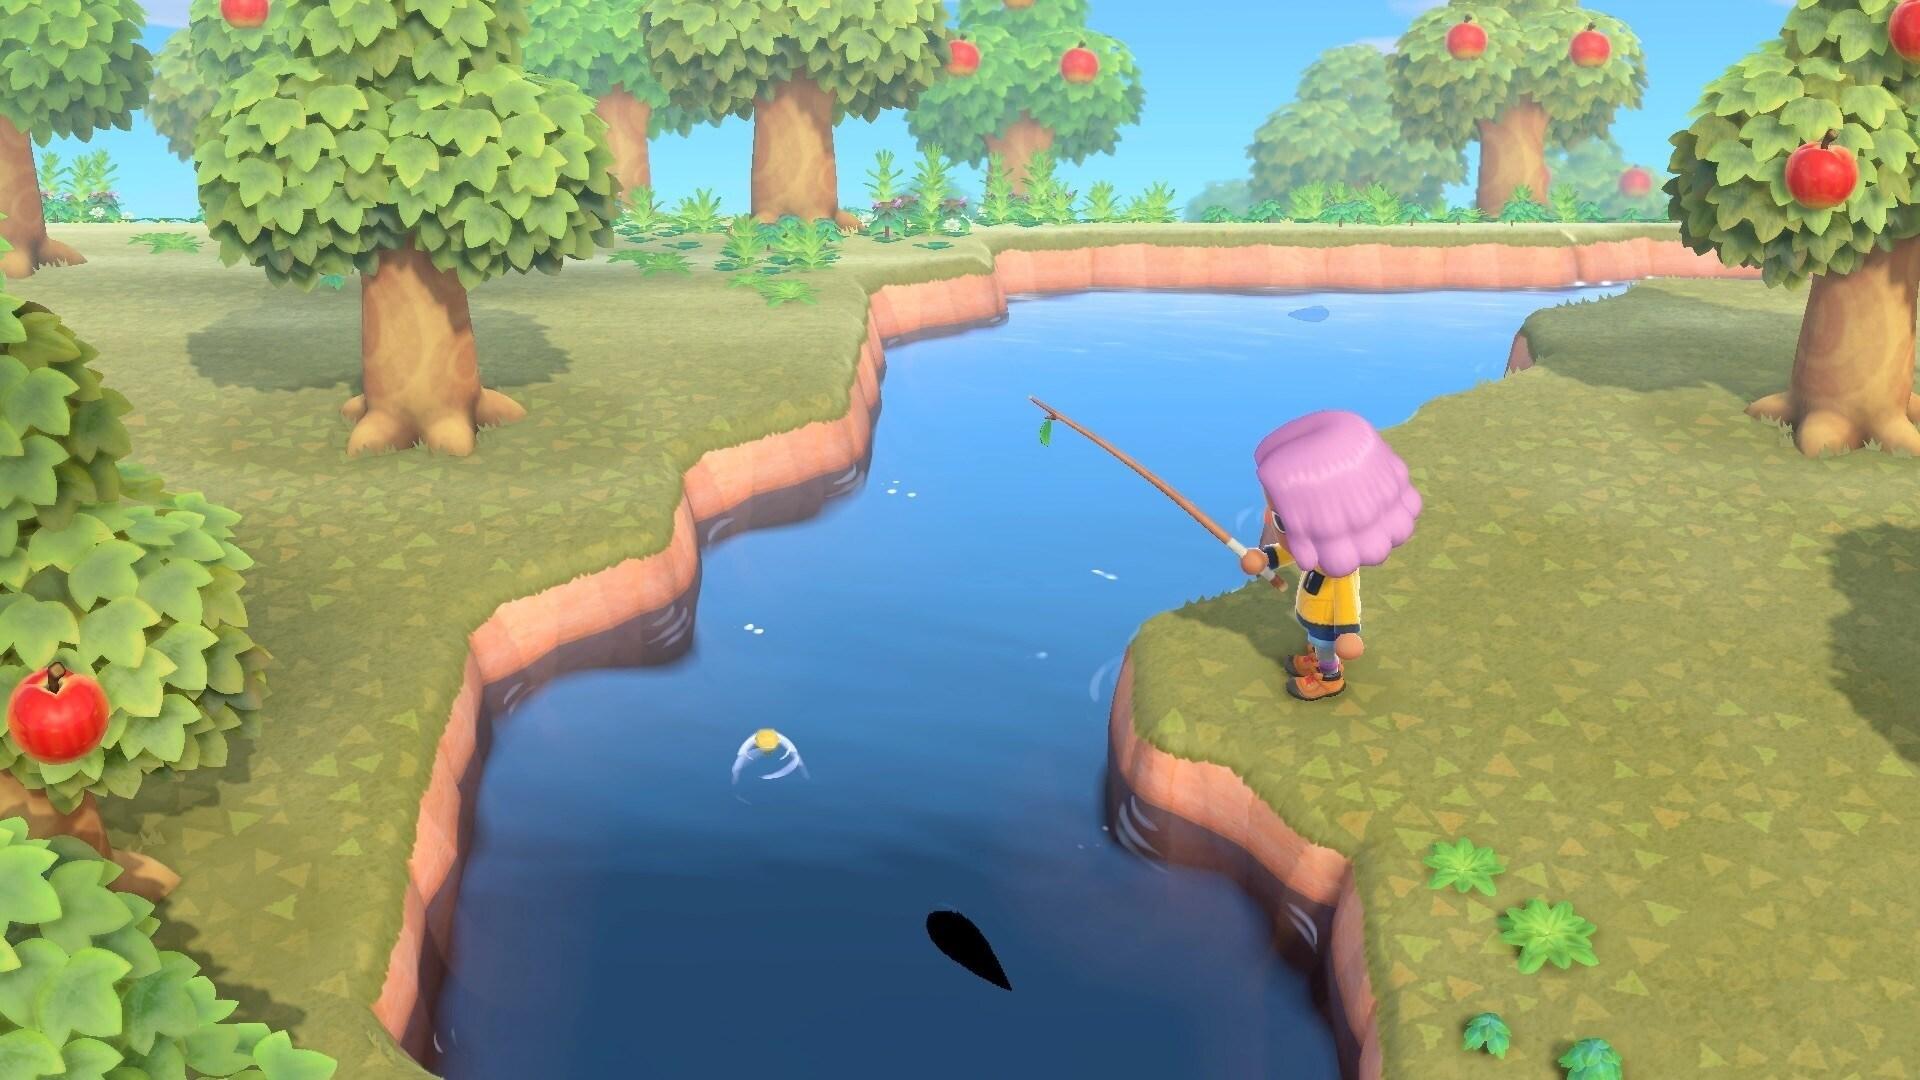 Spielszene aus Nintendo Animal Crossing: New Horizons